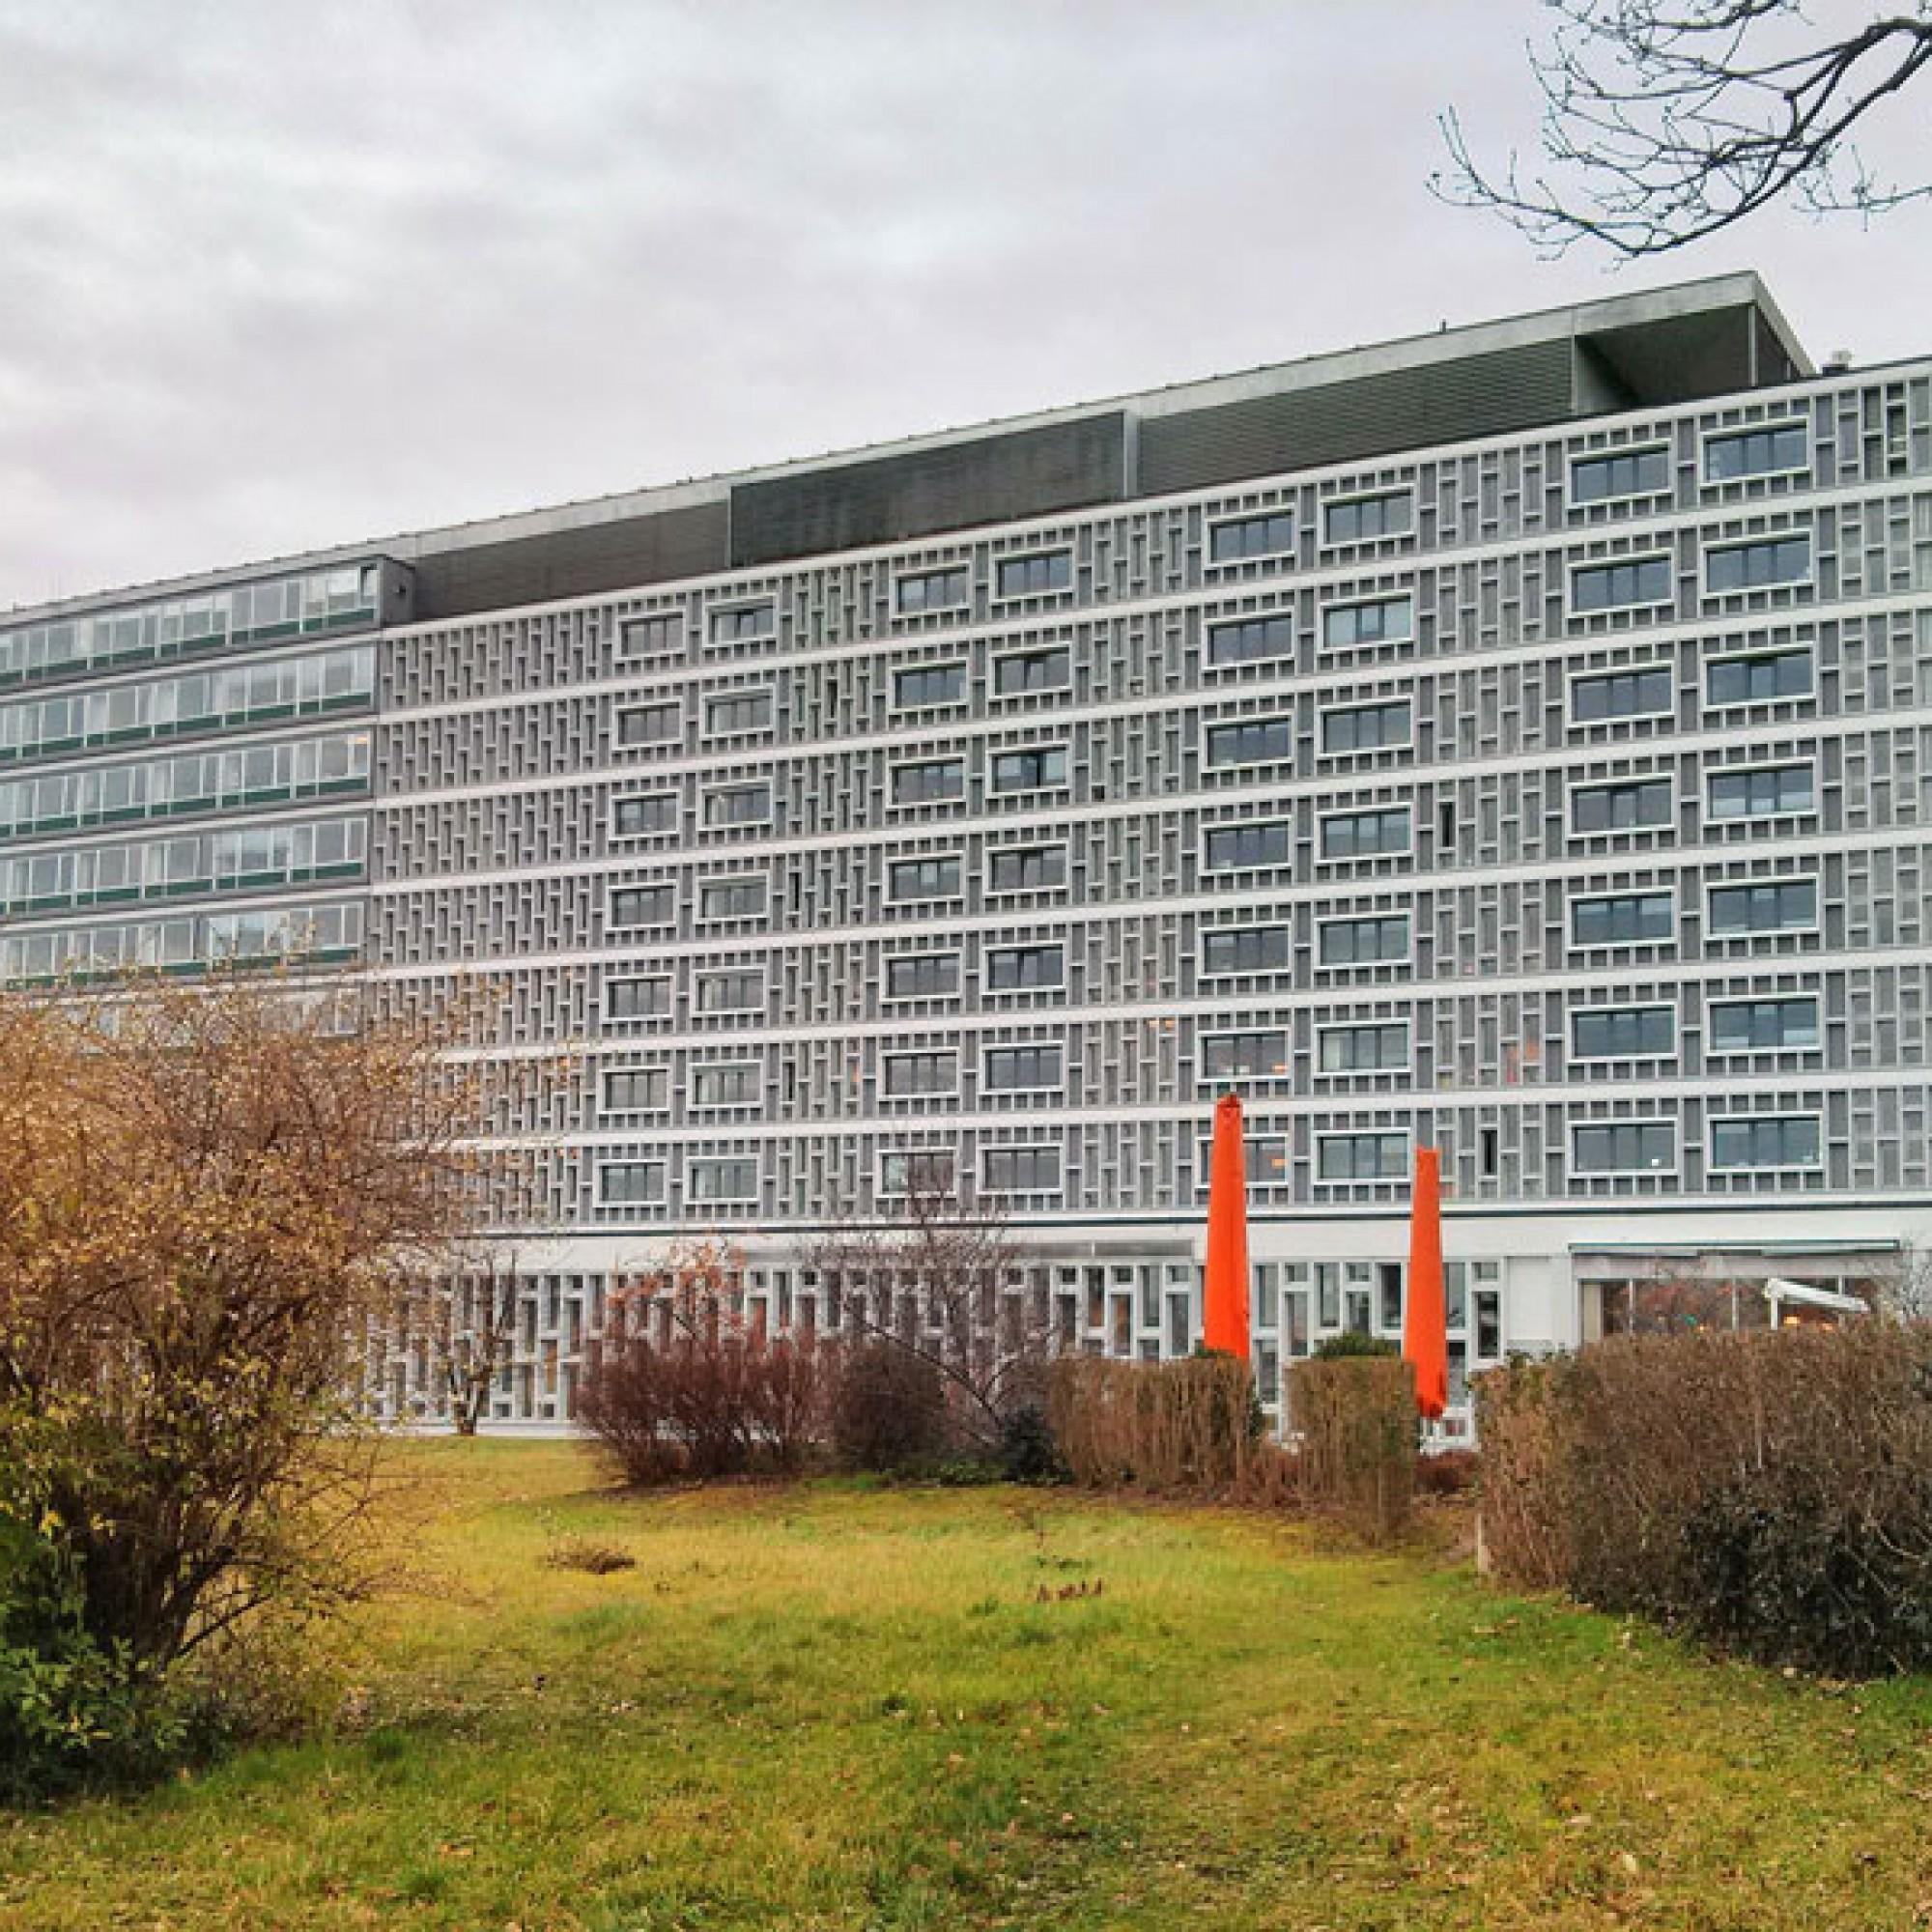 Das Felix-Platter-Spital in Basel soll in einen Wohnkomplex umgewandelt werden (pppspics, flickr, CC)